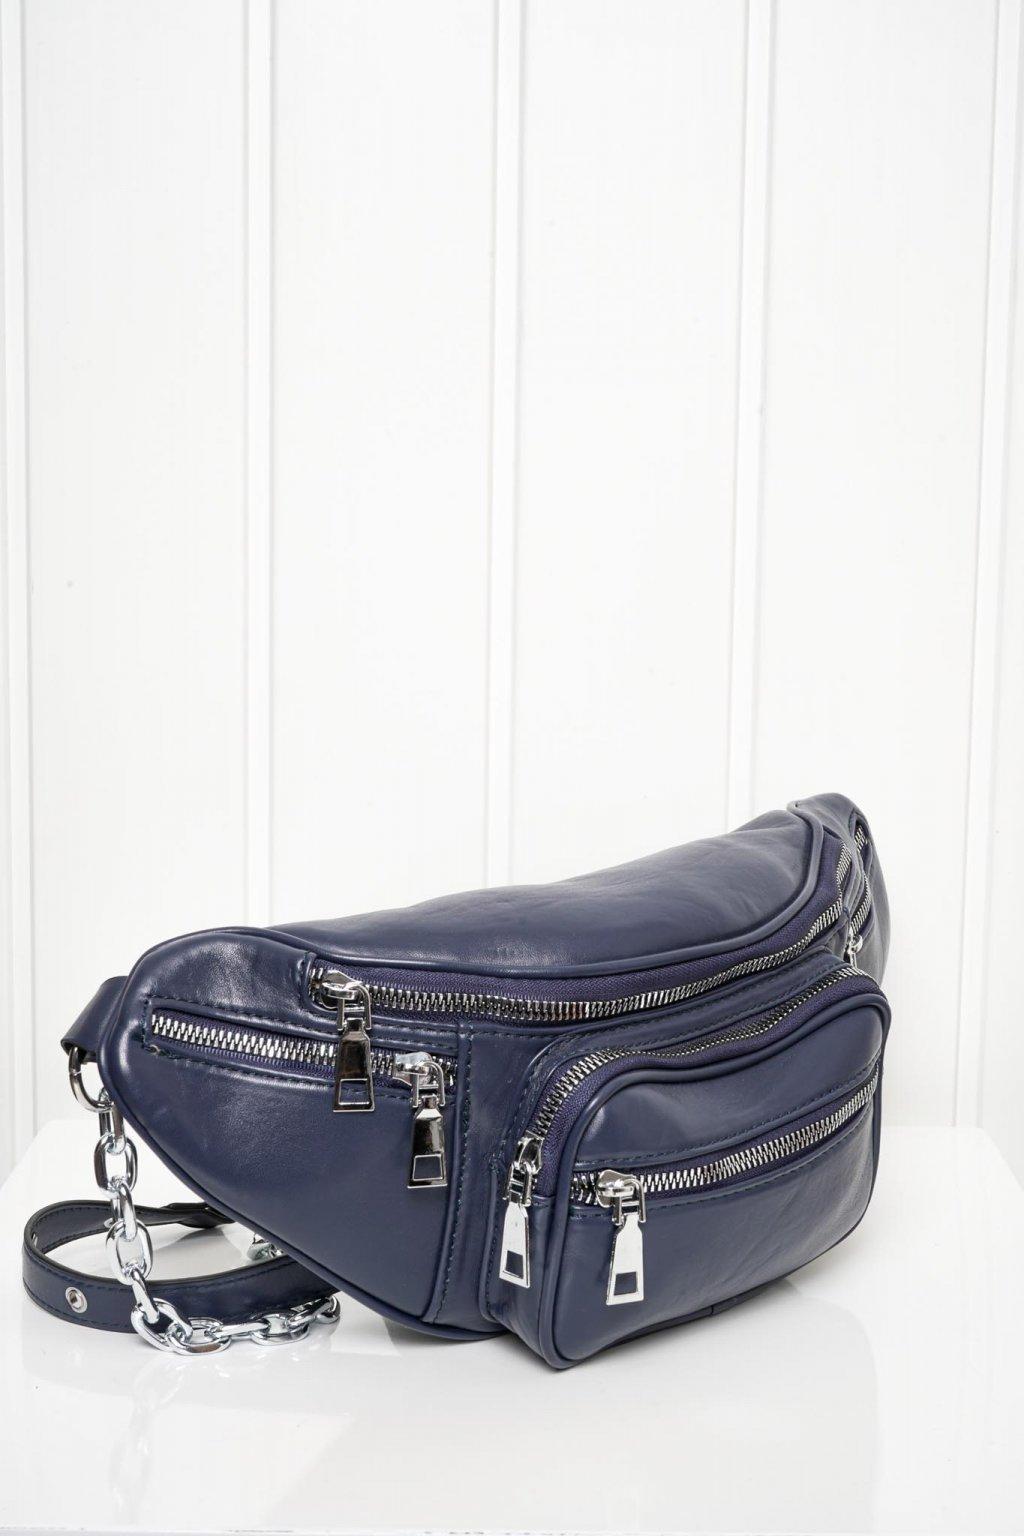 Kabelka, crossbody, ruksak, shopping bag, shopperka, 314